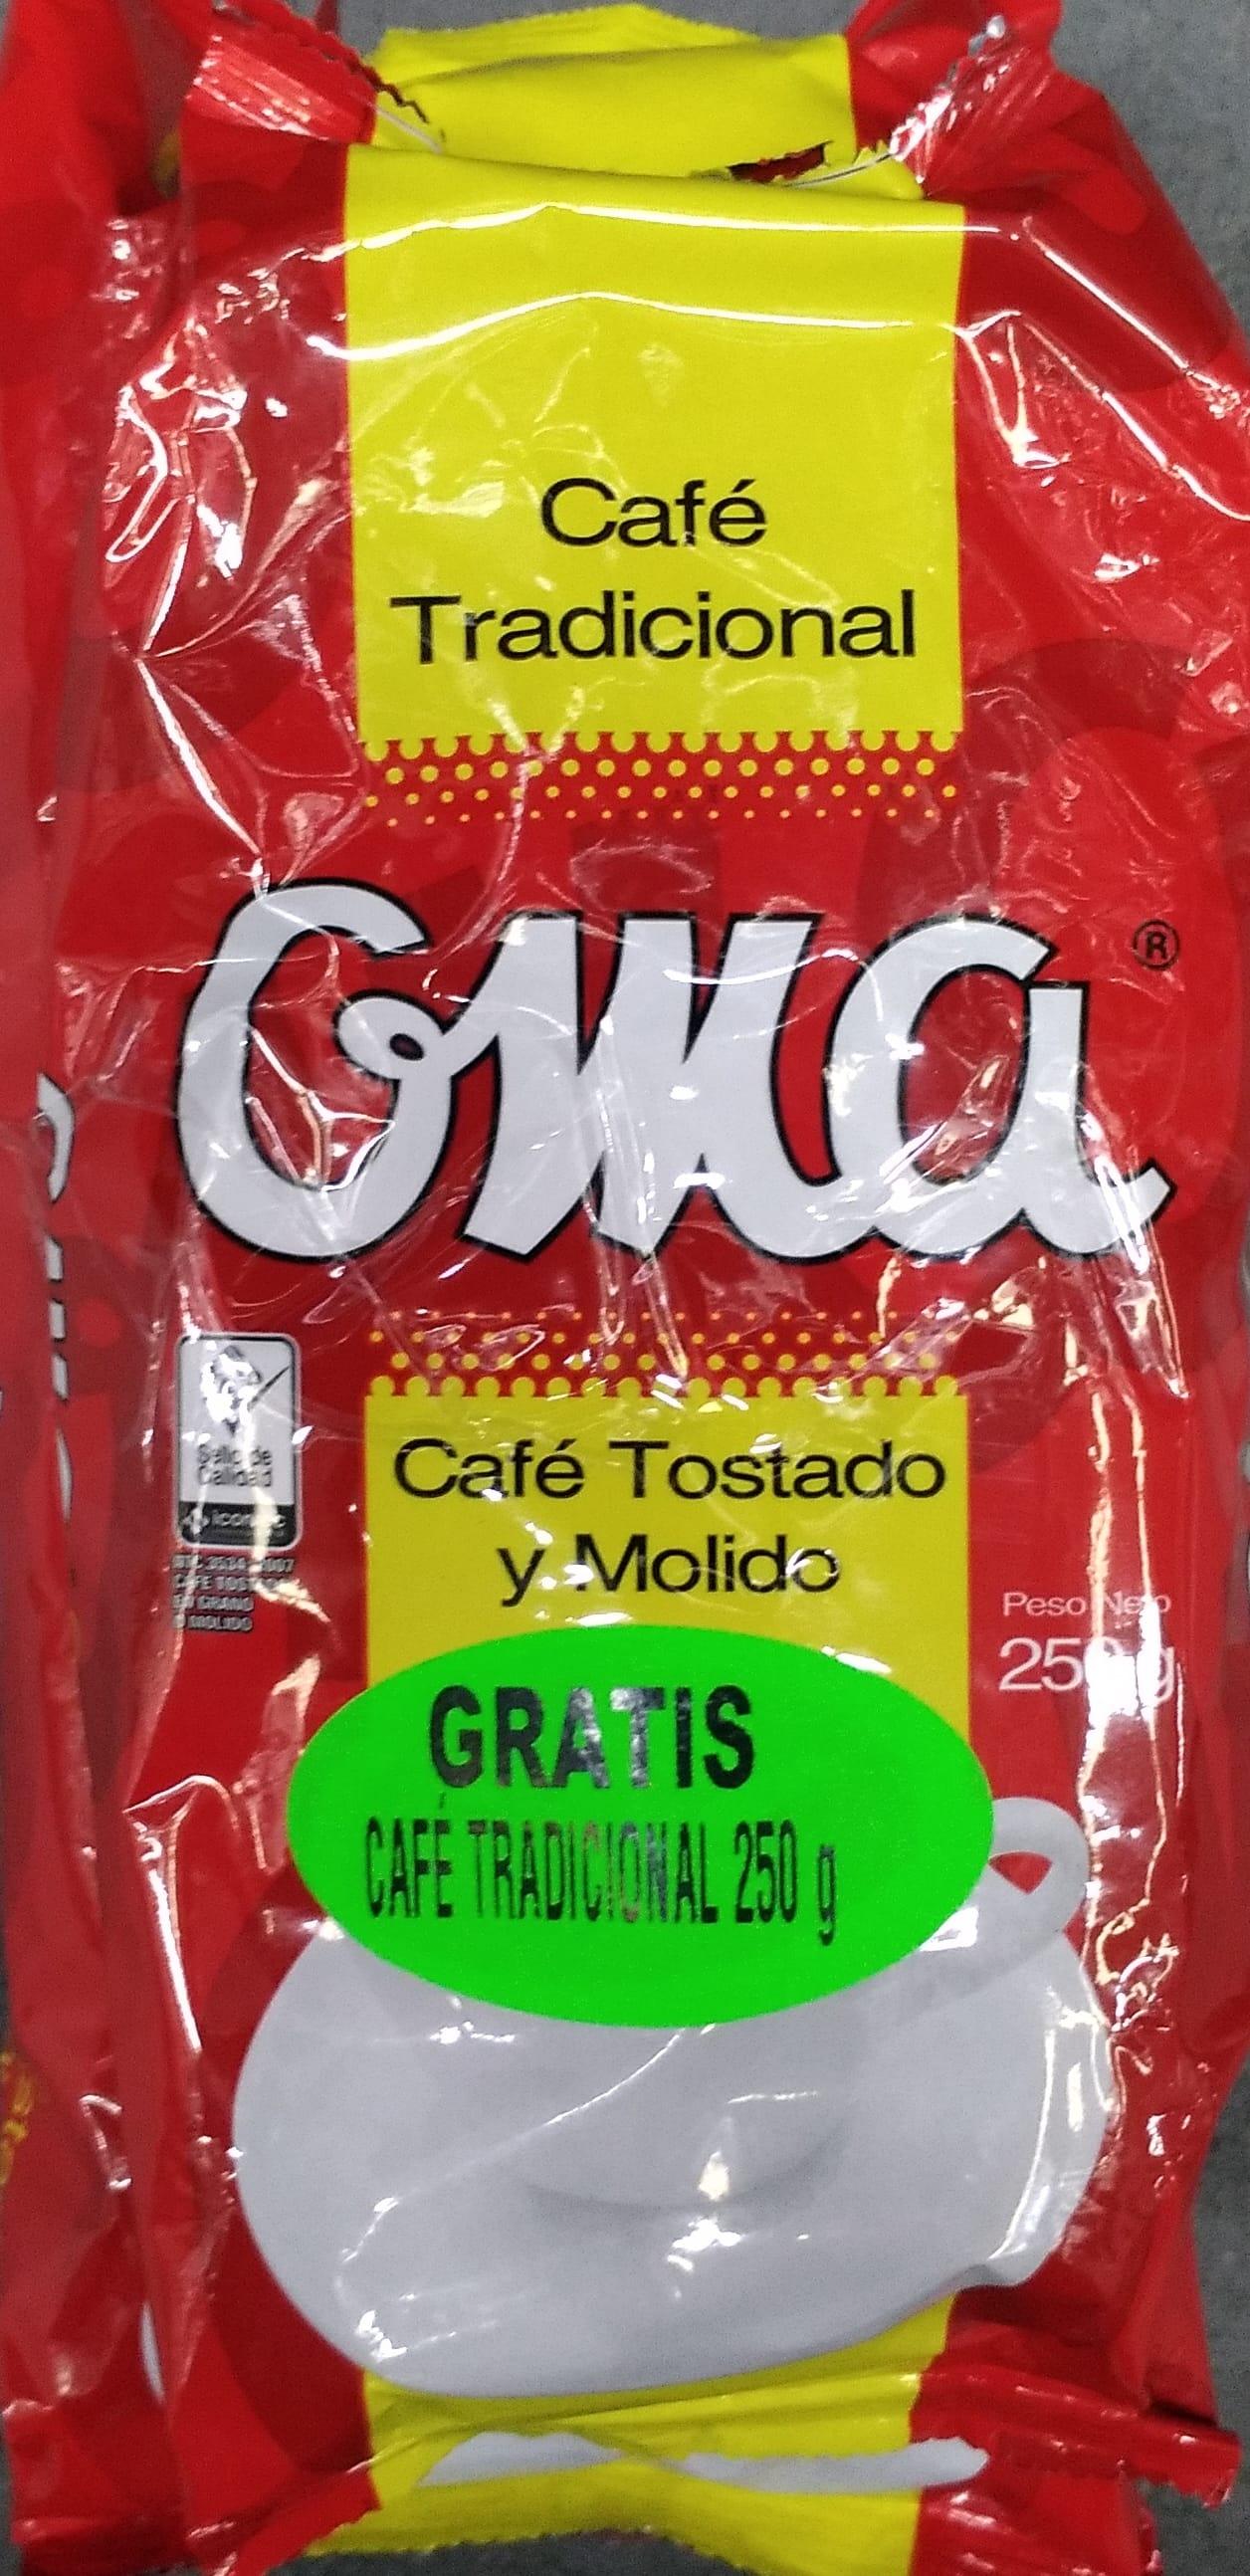 Cafe oma Tradicional Colombiano 500gx2 Gratis 250